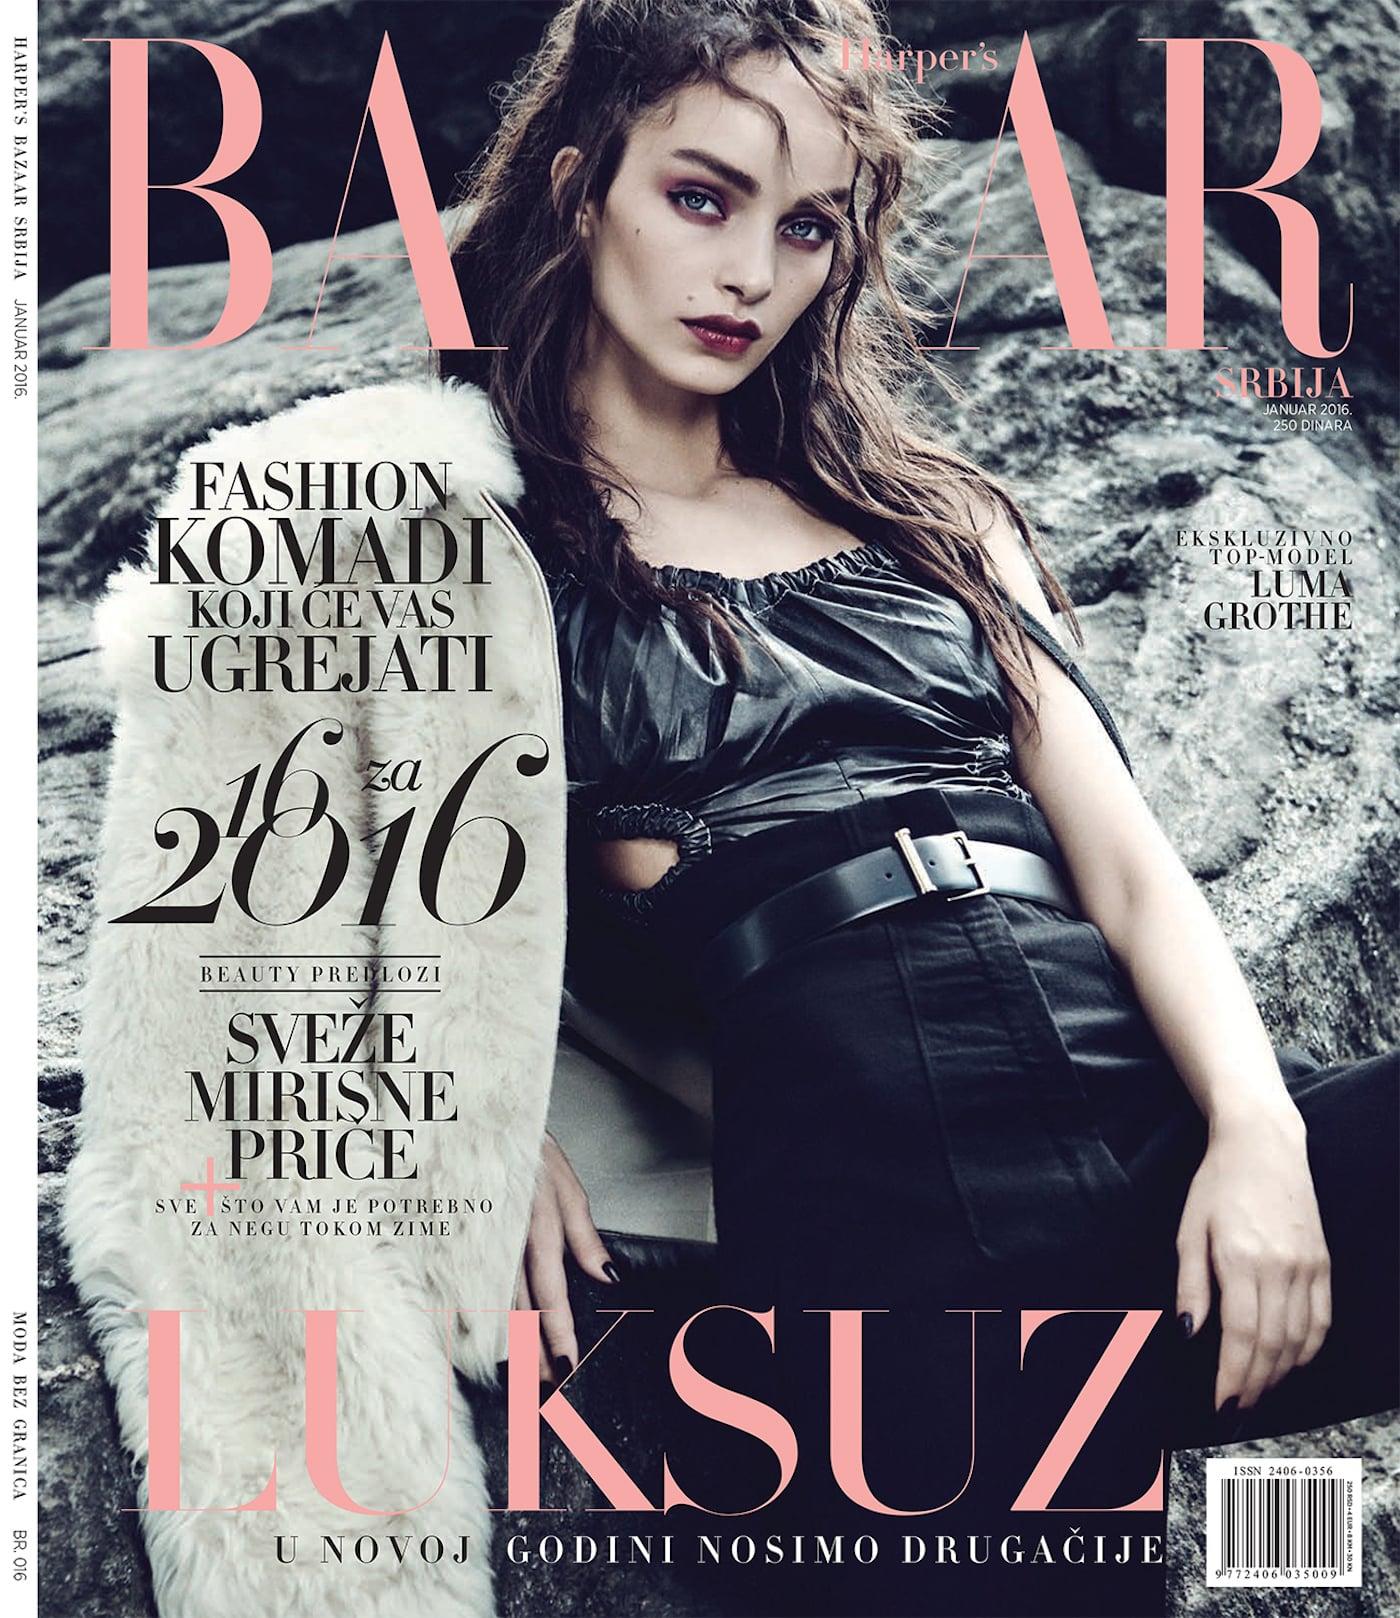 Cover 016 Harpers BAZAAR Januar 2016Final.jpg